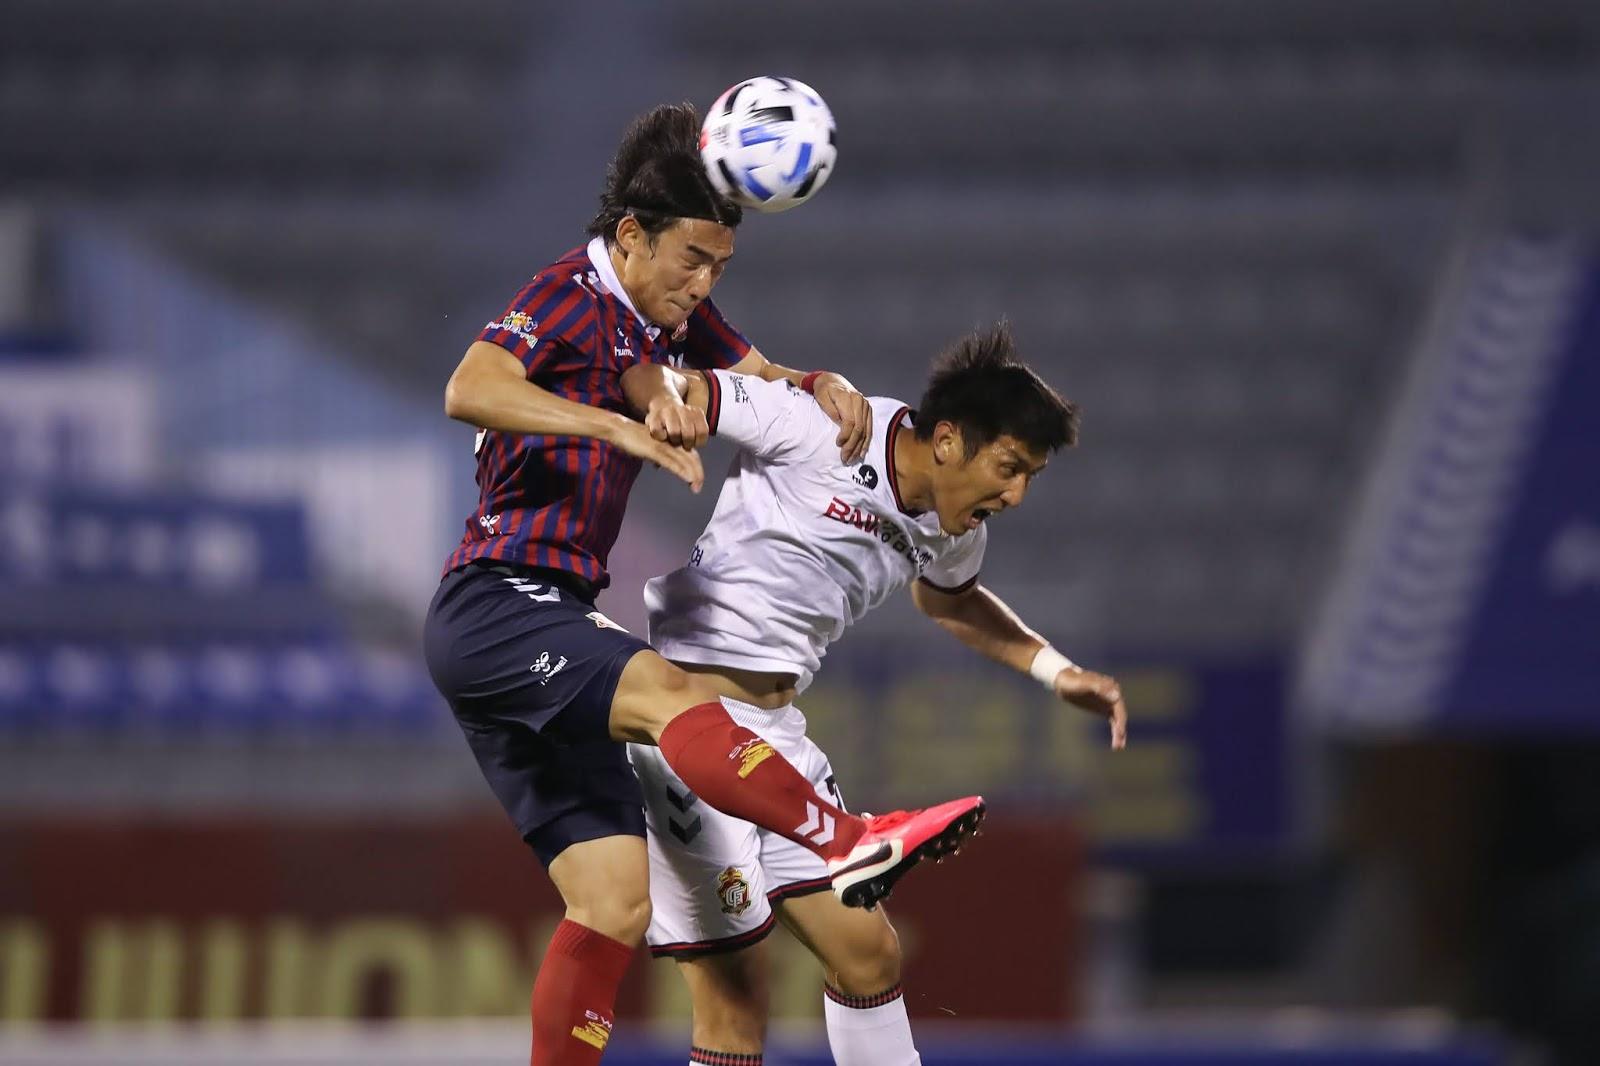 Preview: Gyeongnam FC vs Suown FC